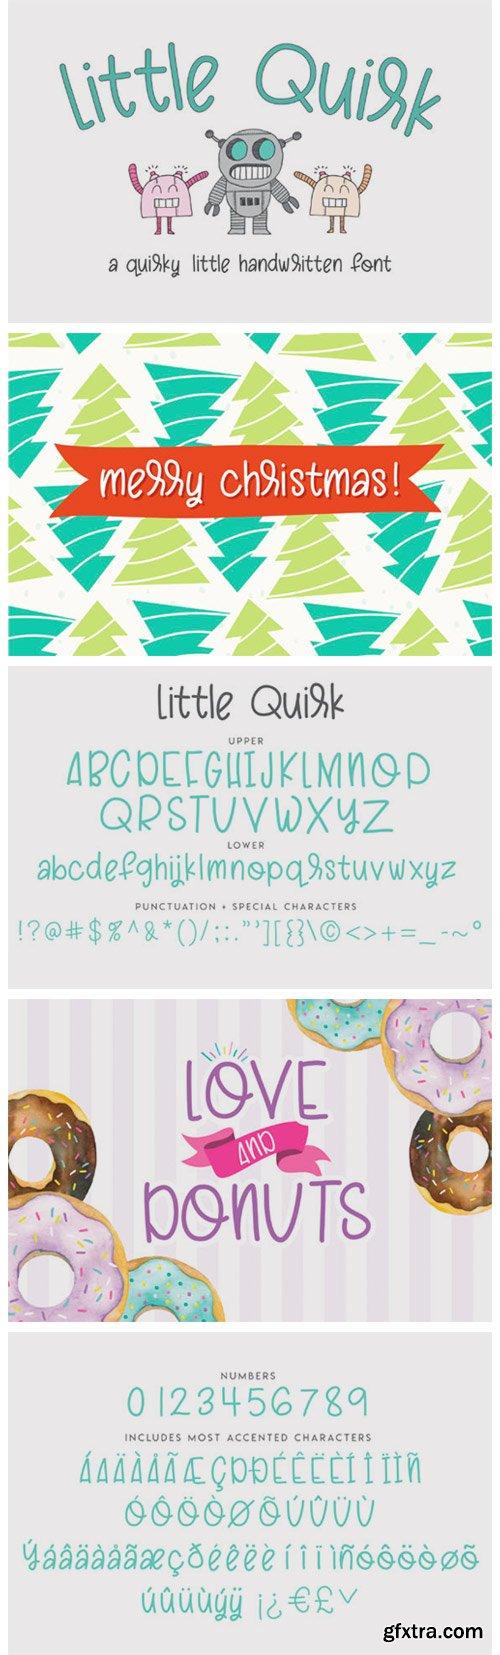 Little Quirk Font